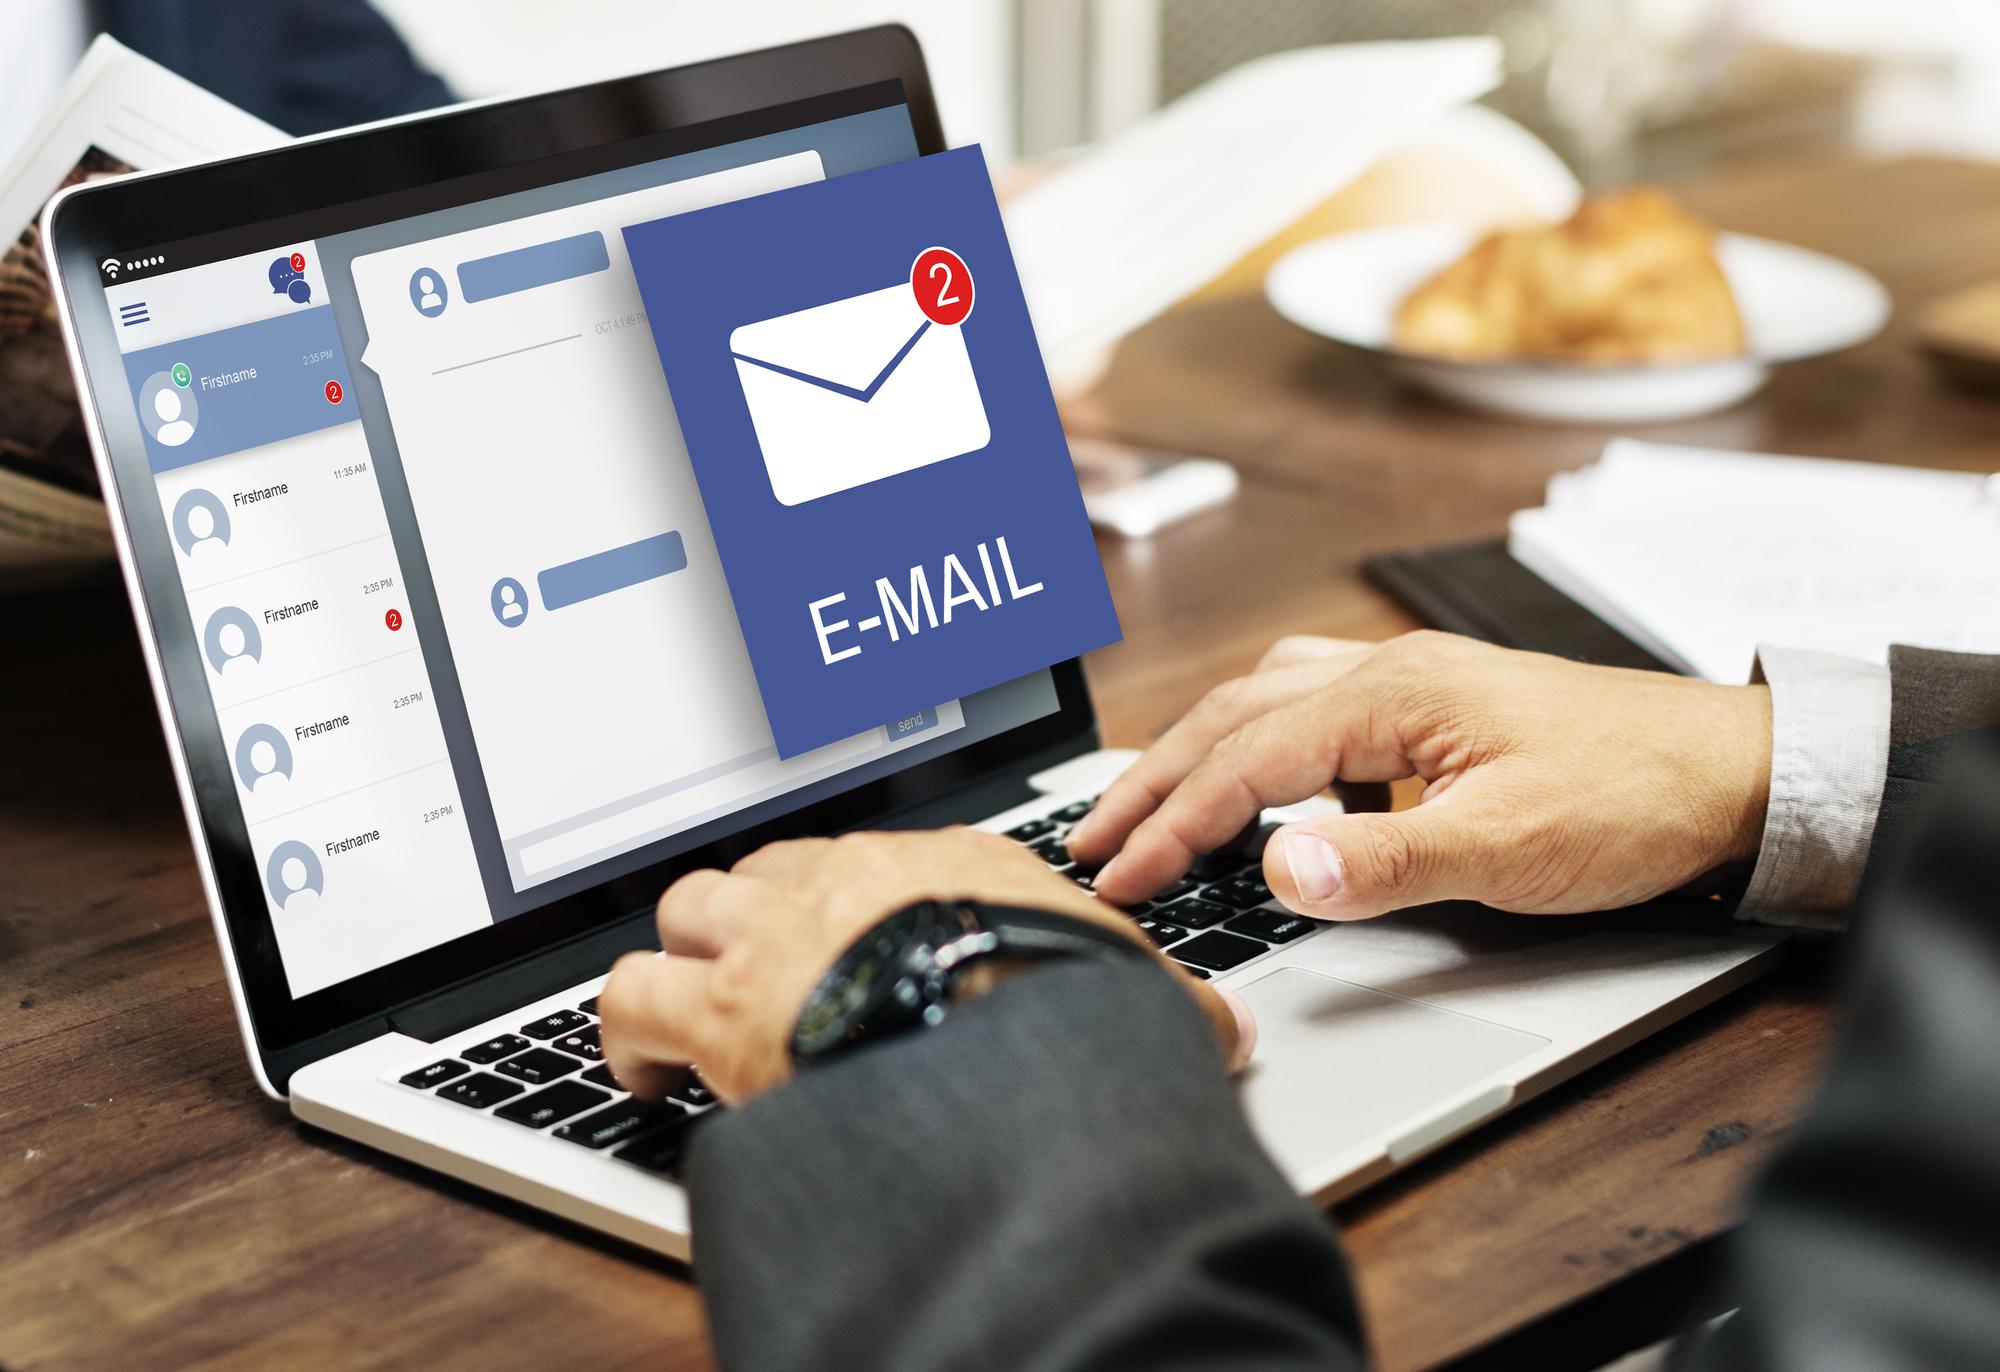 dd63cd28a9 メールソフトとは、サーバーを経由してメールの送受信などを行うためのソフトウェアのことです。この項目では、メールソフトの基本的な性能や主な特徴などを解説して  ...